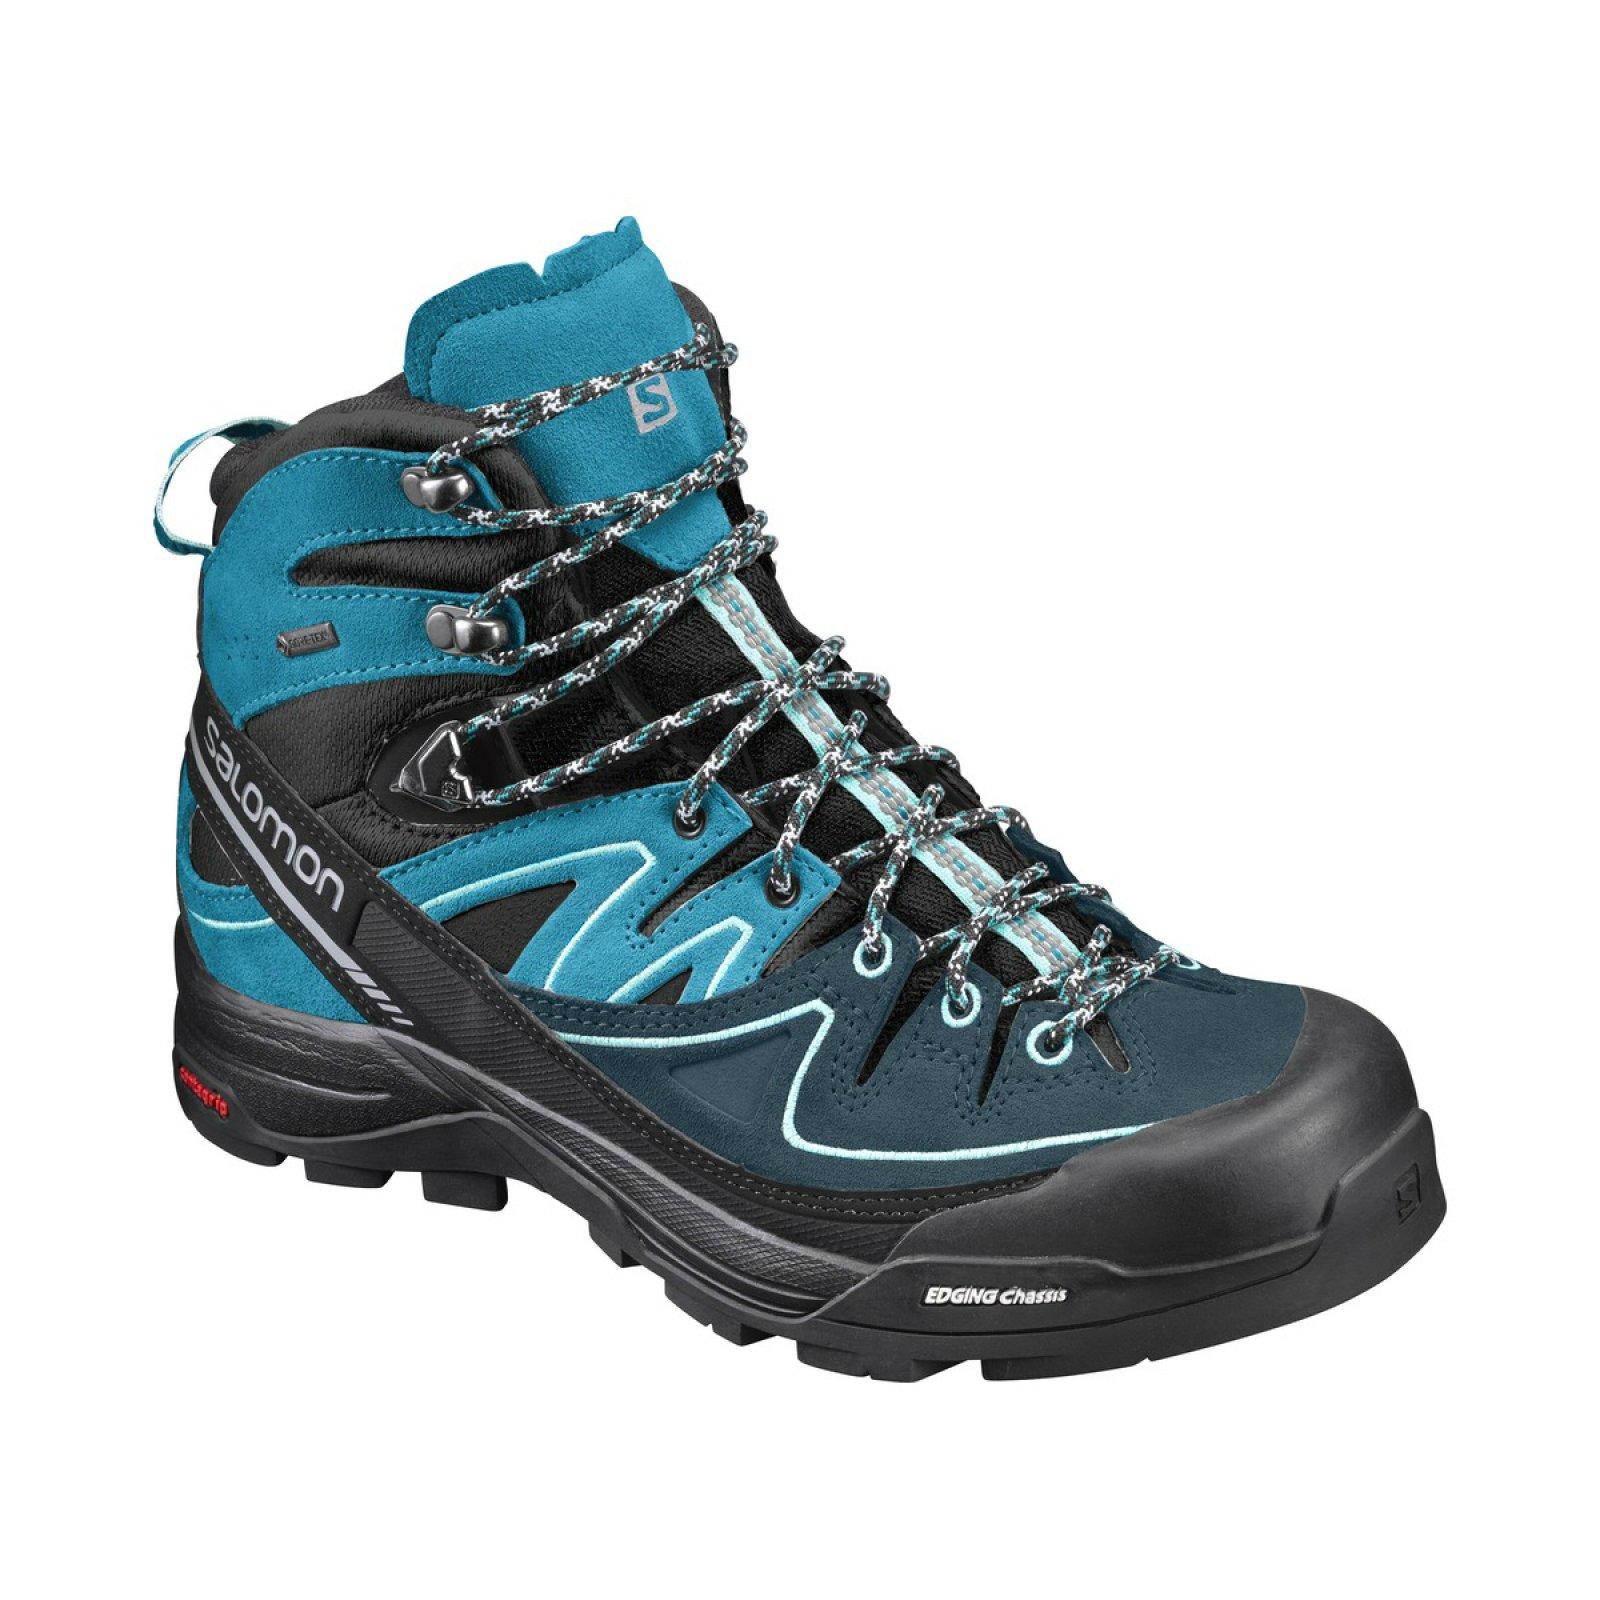 Outdoorové boty Salomon X Alp Mid LTR GTX W L39470200 - Actisport.cz 0001dc224d9